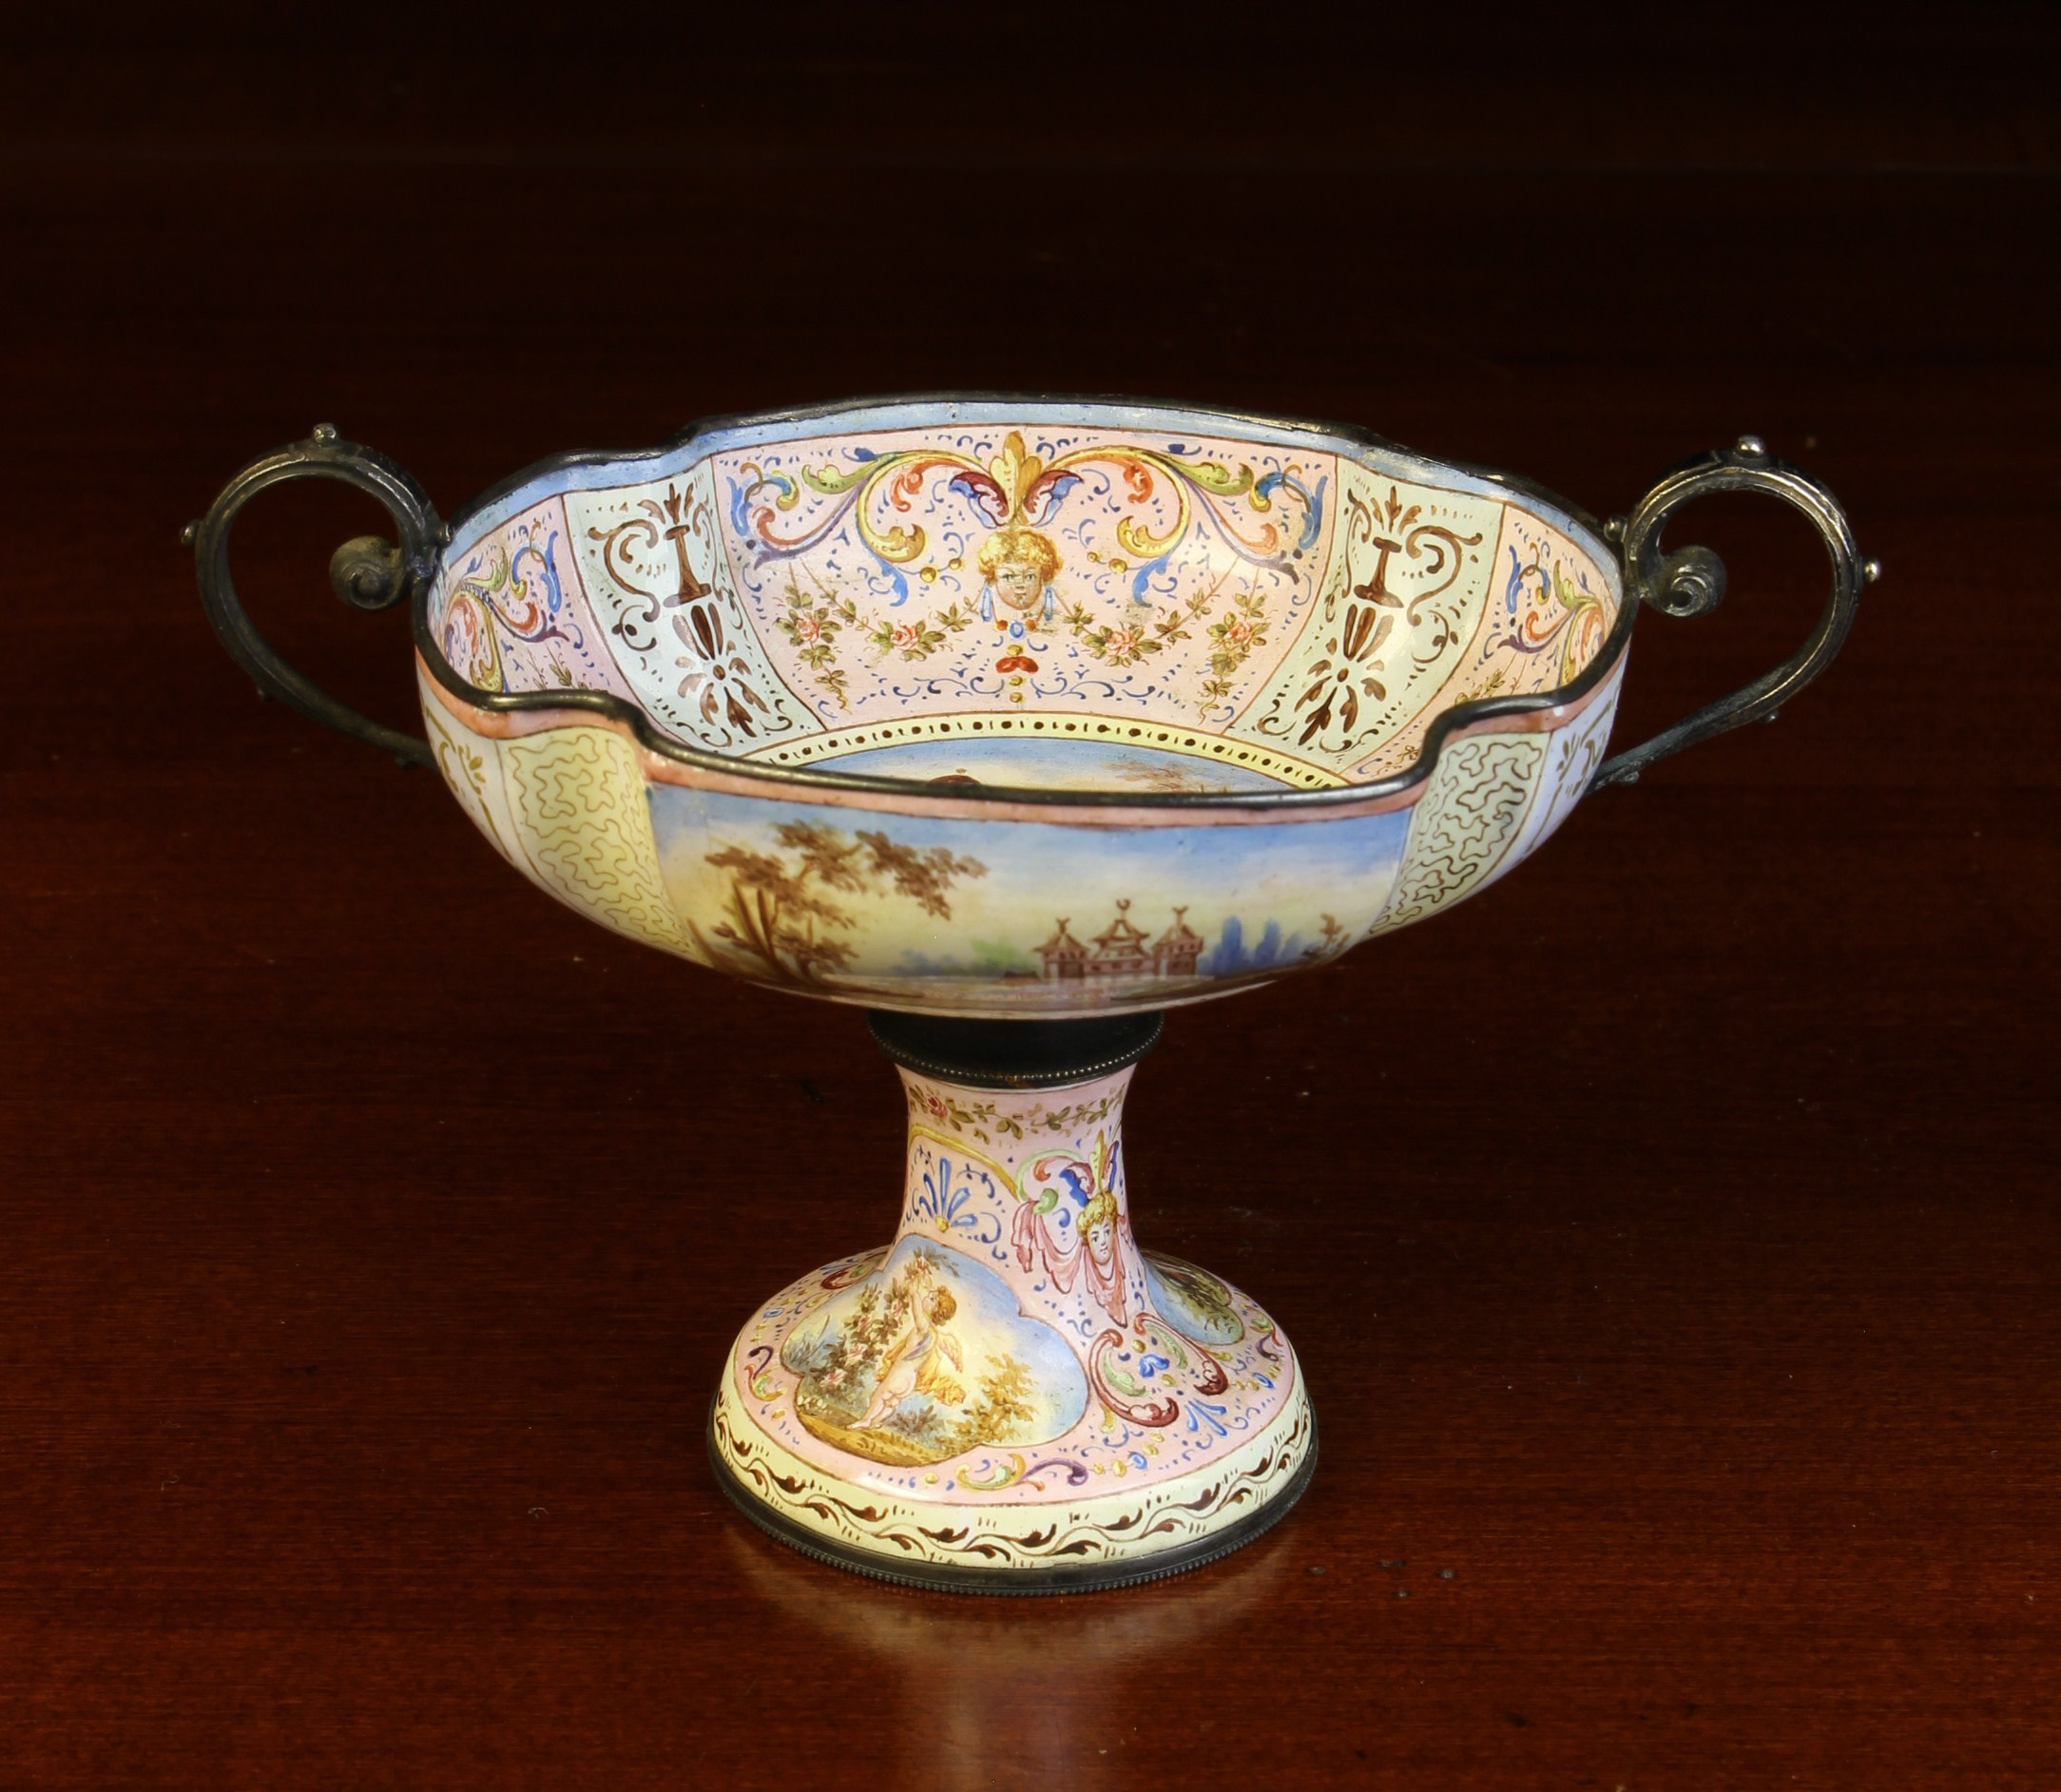 A 19th Century Vienna Enamel Miniature Comport. - Image 2 of 4